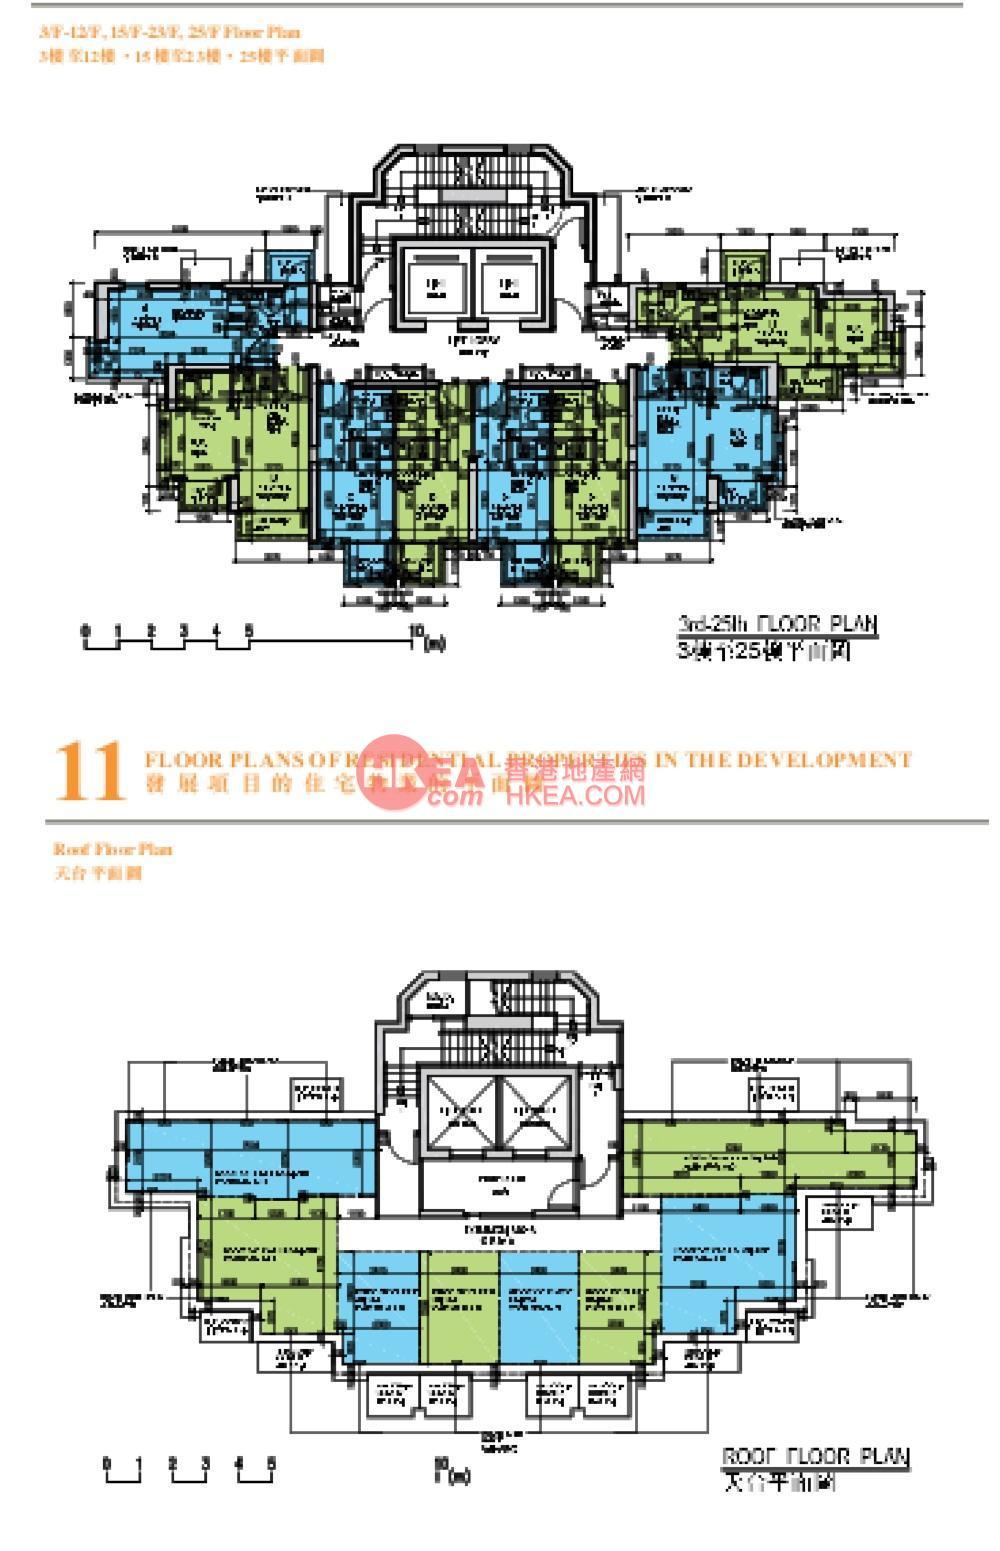 深水埗 AVA 228|03-25(ABCDEFGH)